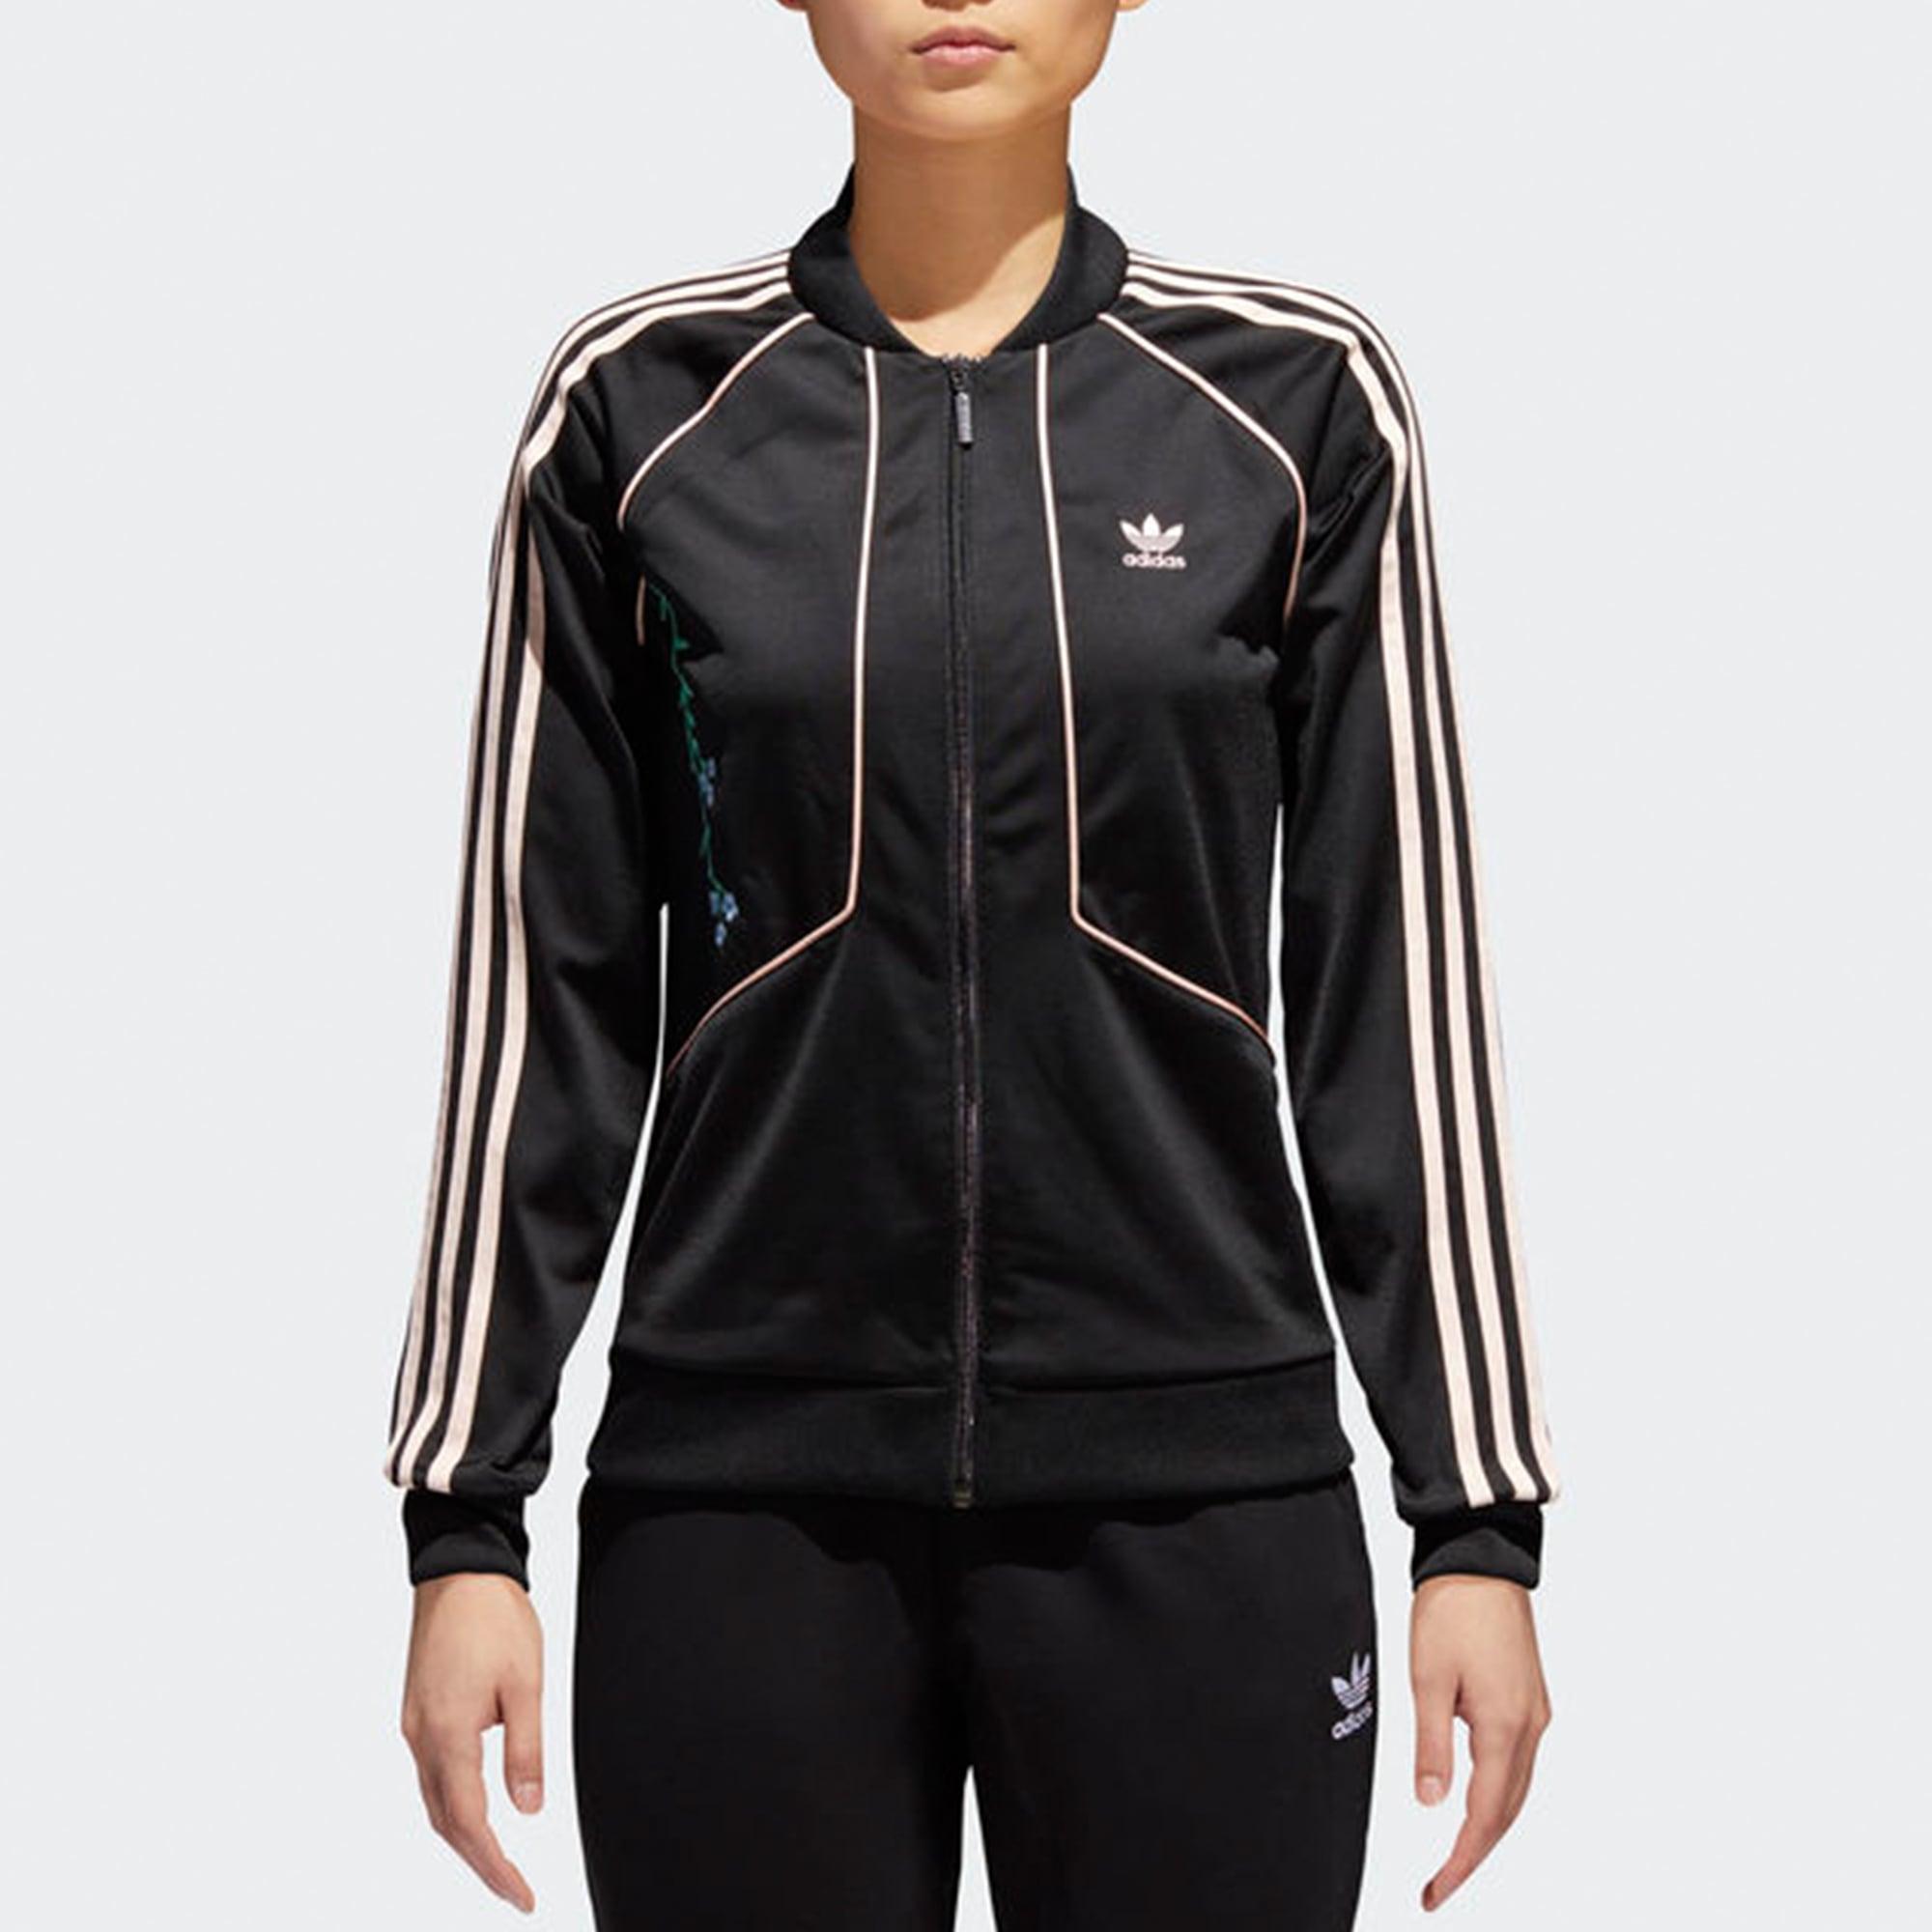 Adidas Originals Womens Women's SST Track Top - Black